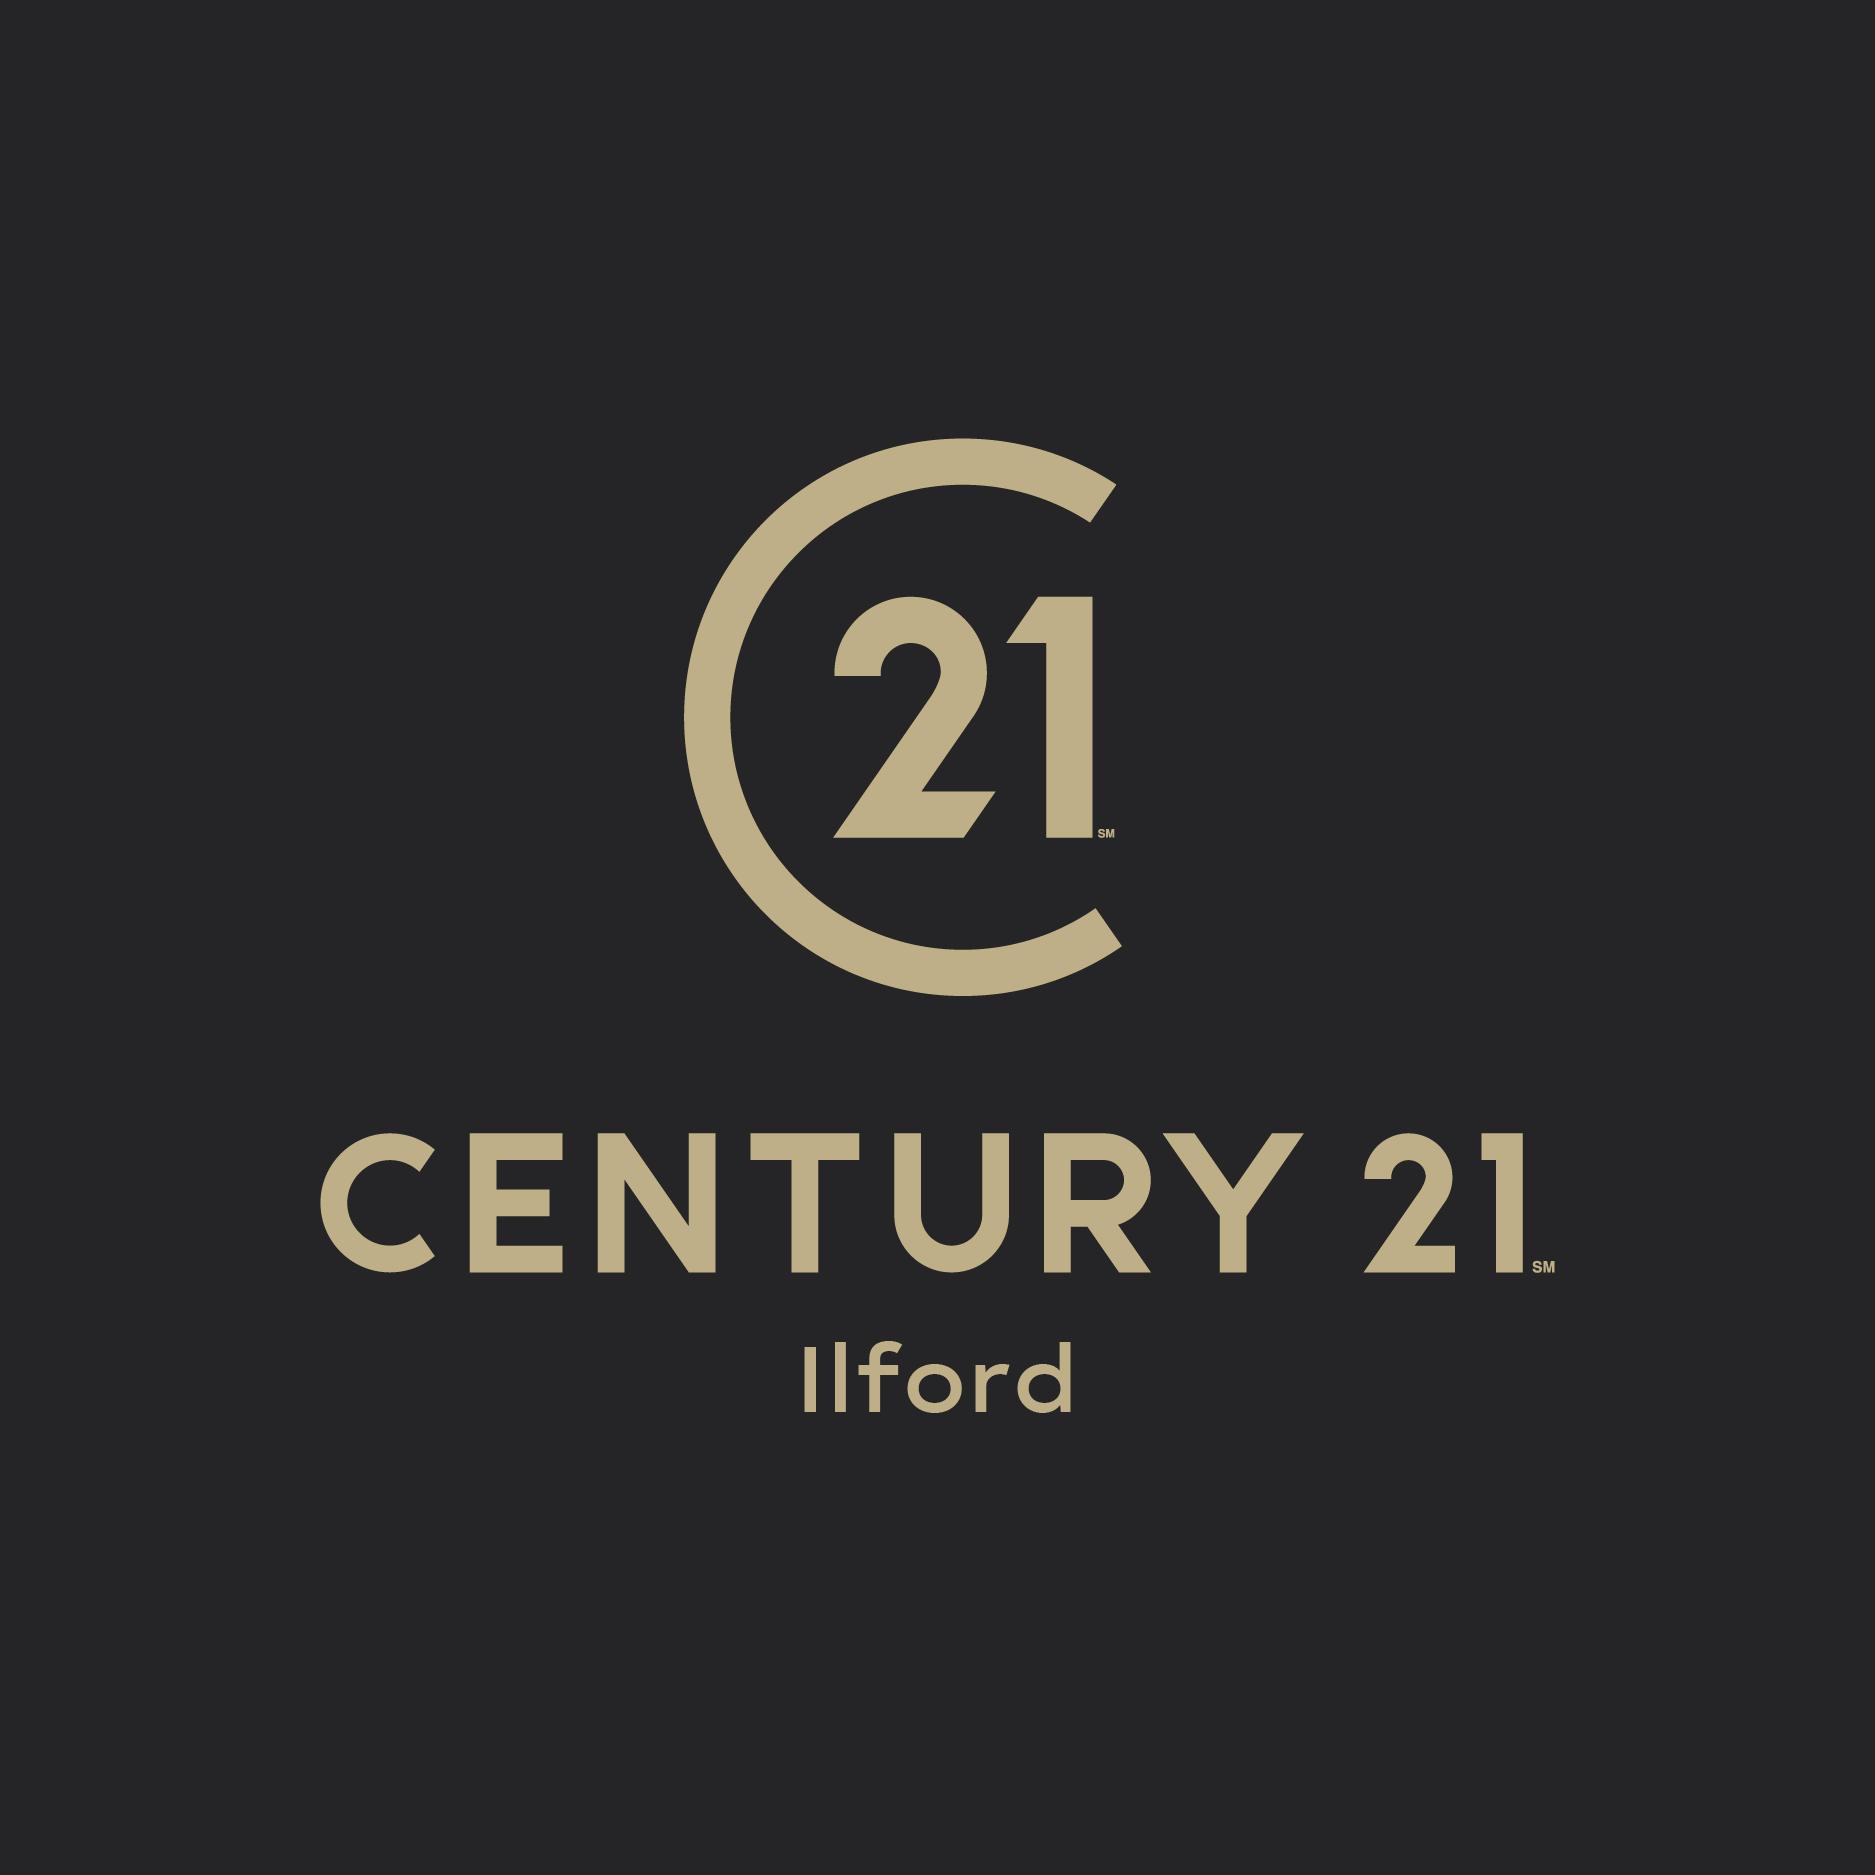 Century 21 - Ilford